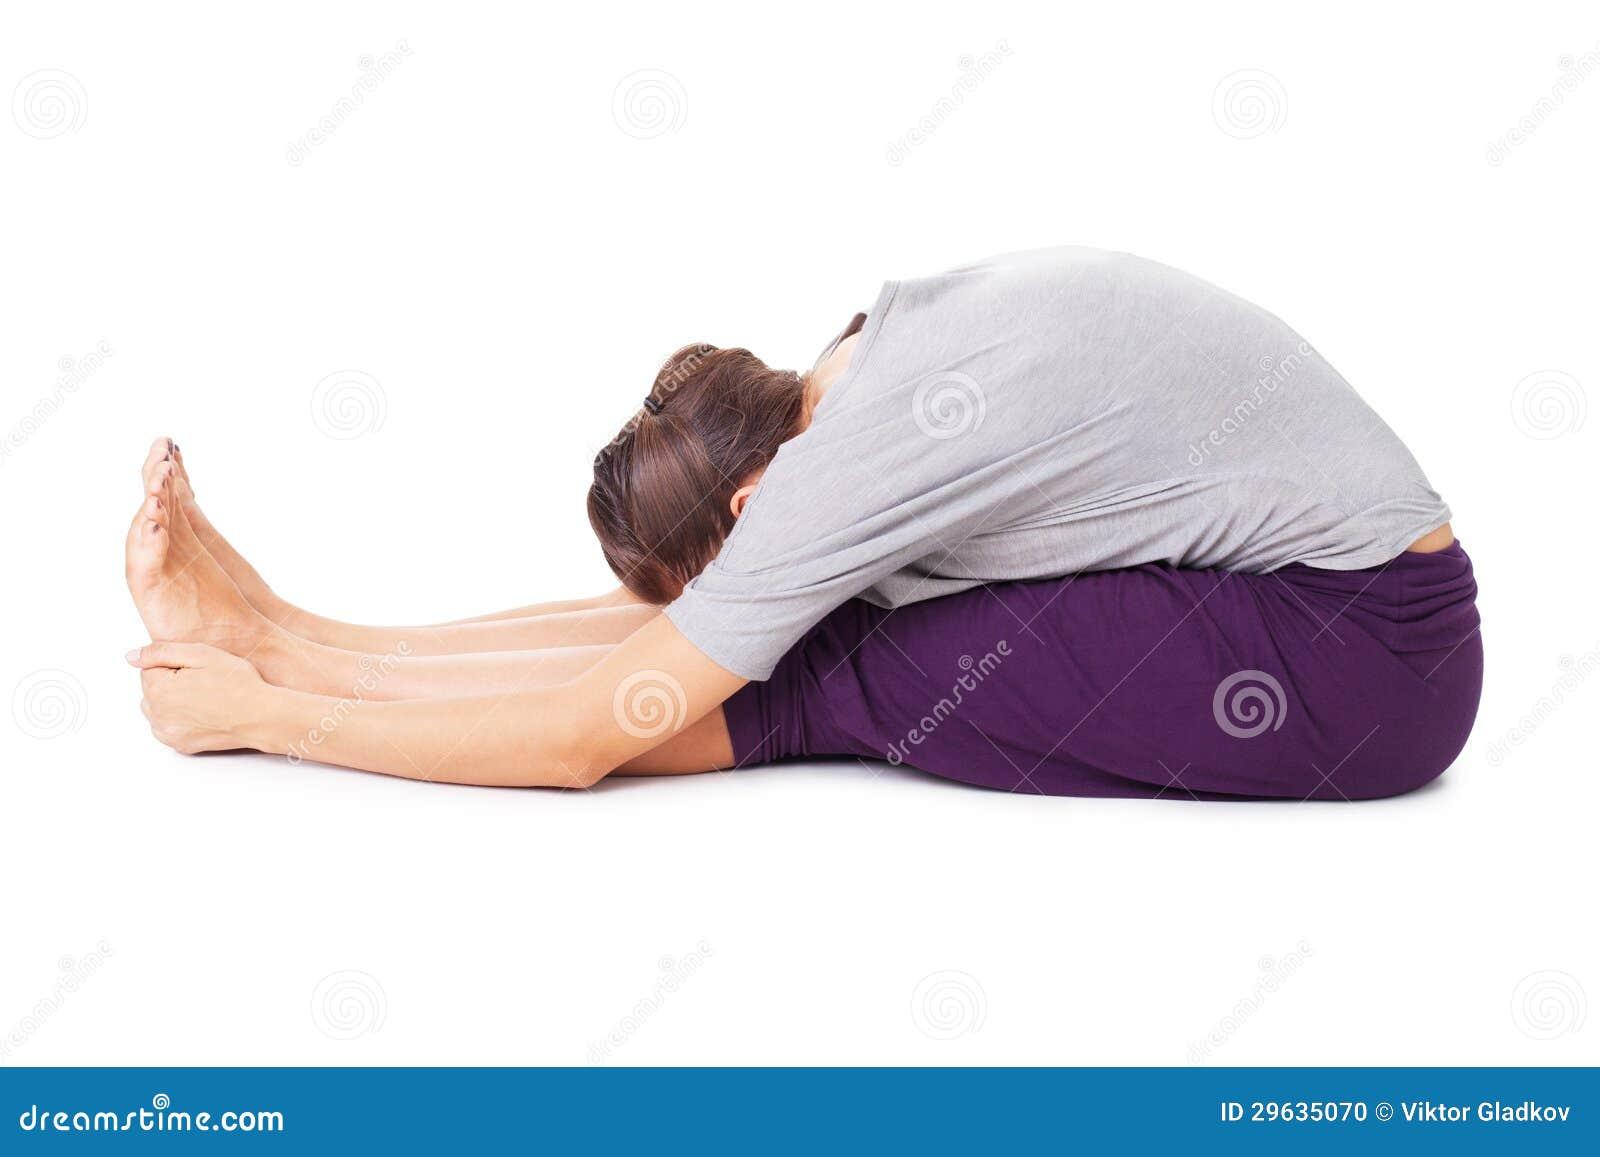 Young woman doing yoga asana seated forward bend paschimottanasana